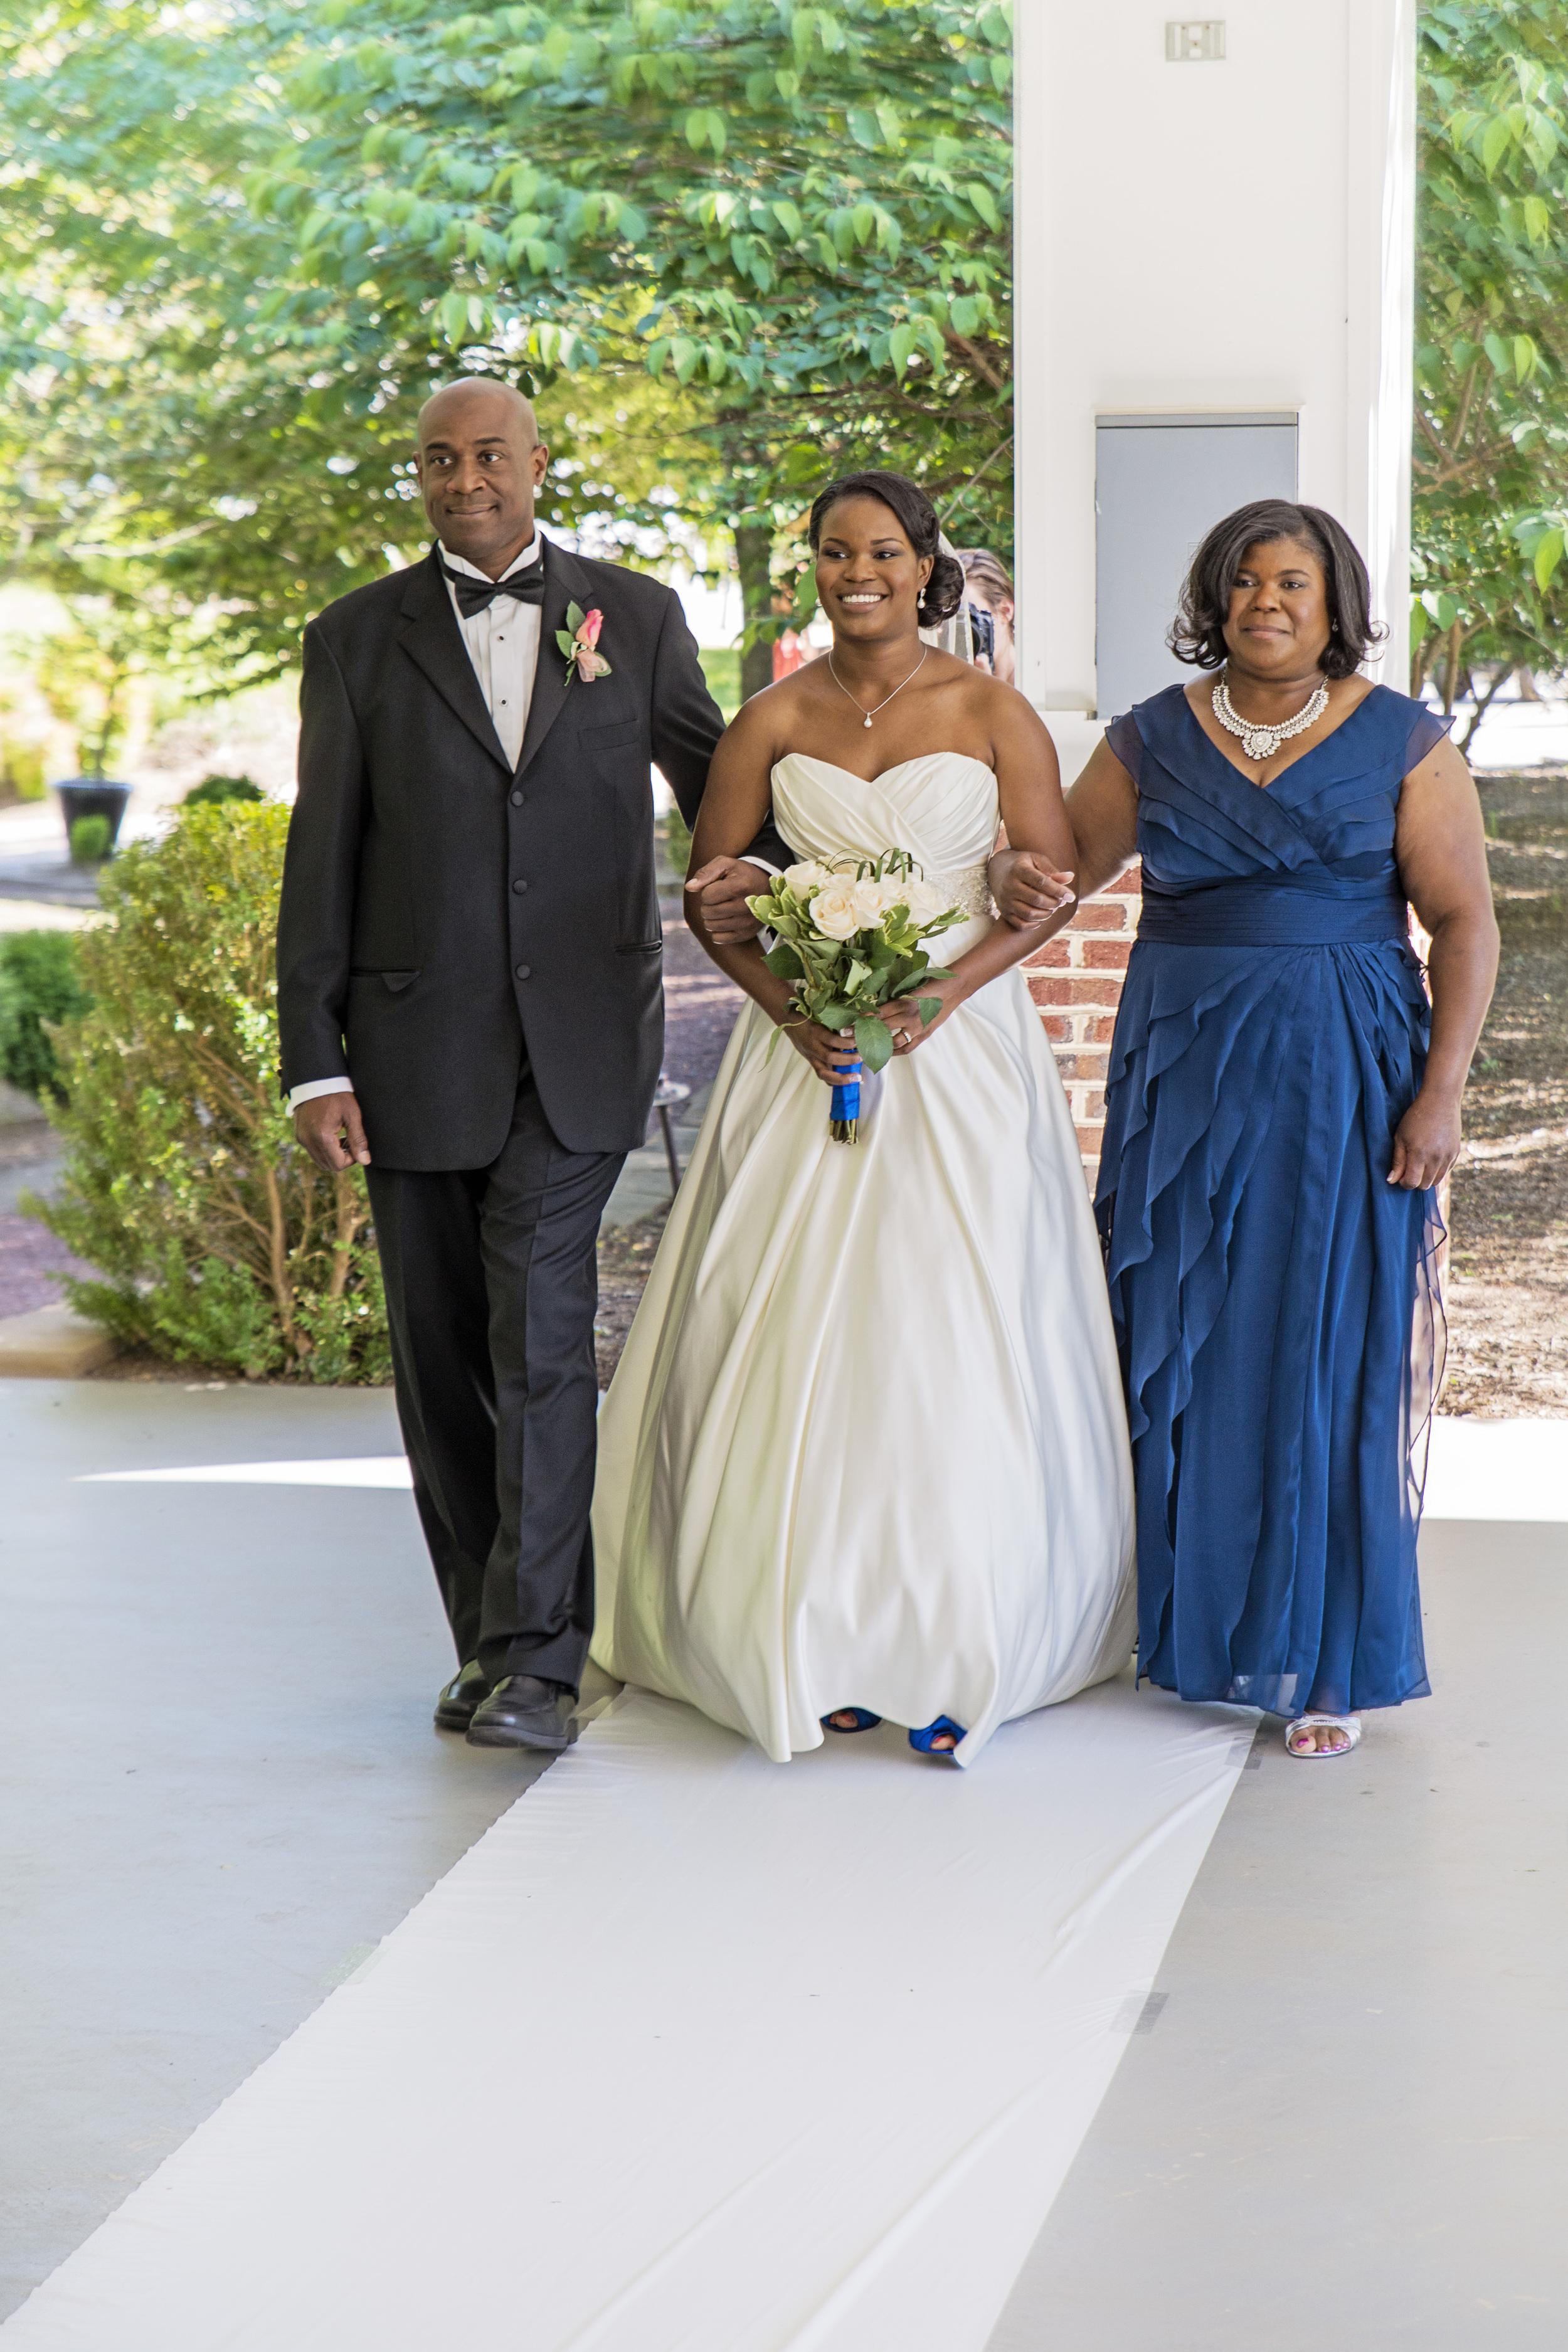 mount_vernon_summer_wedding_lynchburg_va010.jpg